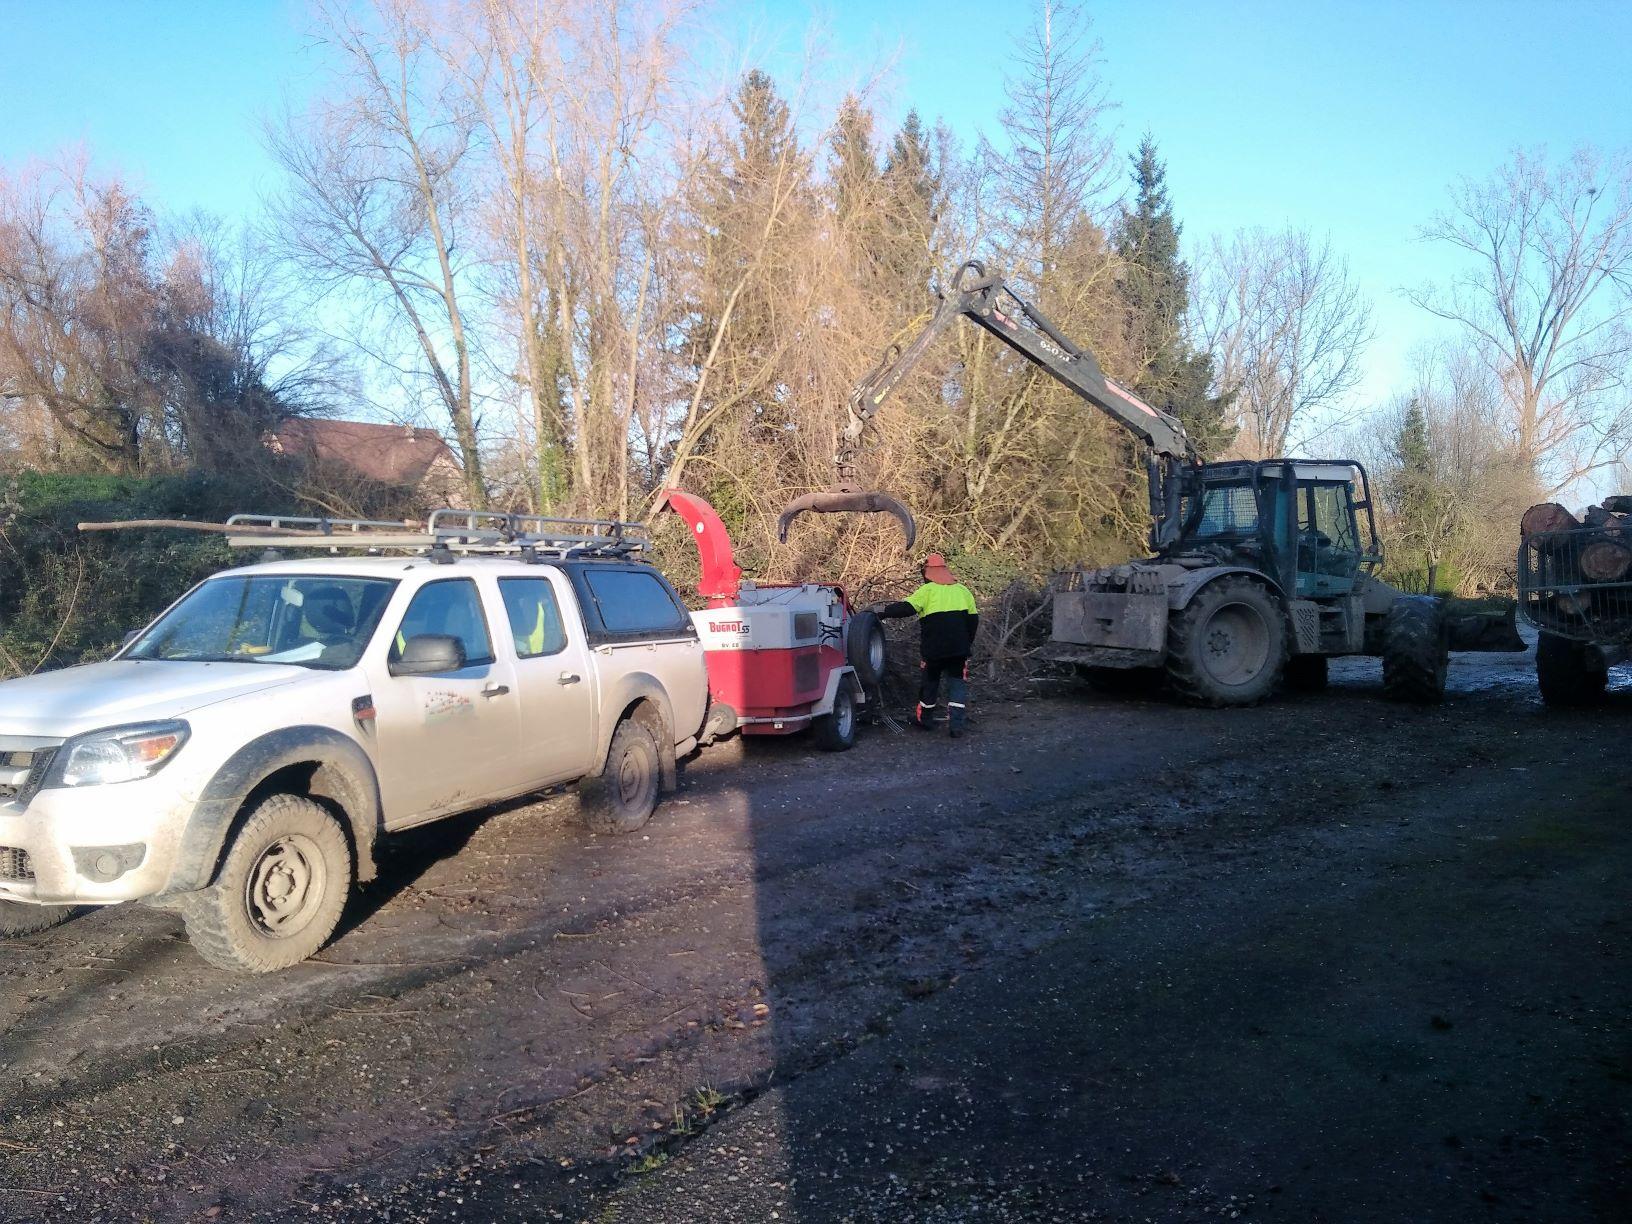 Broyage des branchages issus du chantier du Rosenmeer